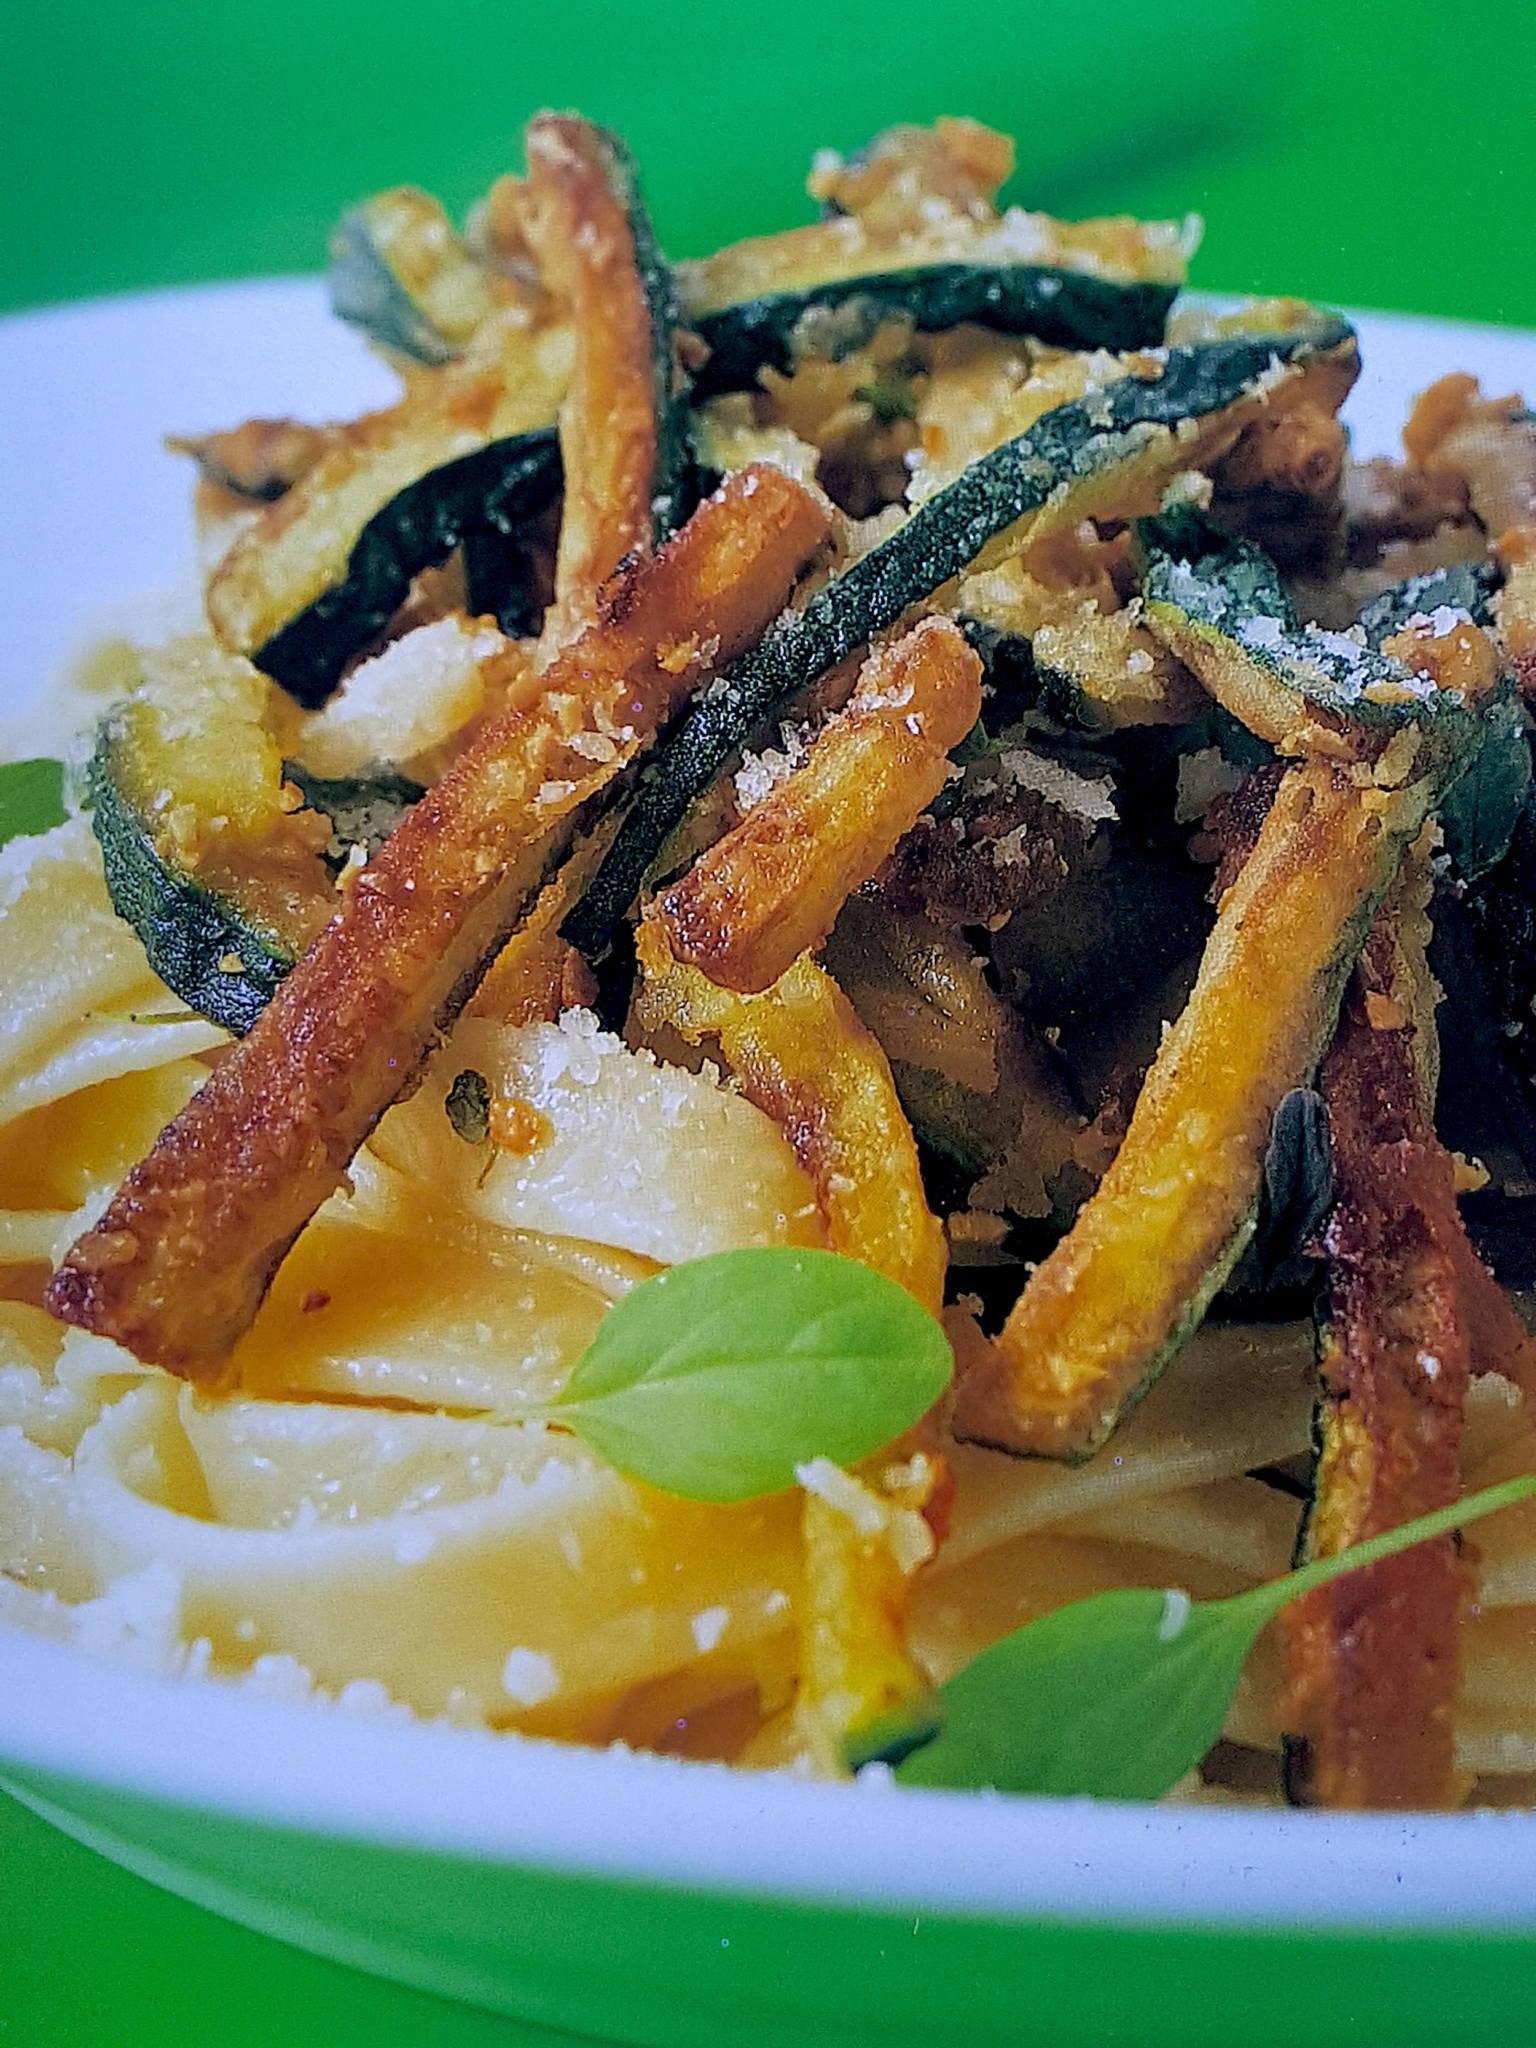 Fettuccine with Zucchini